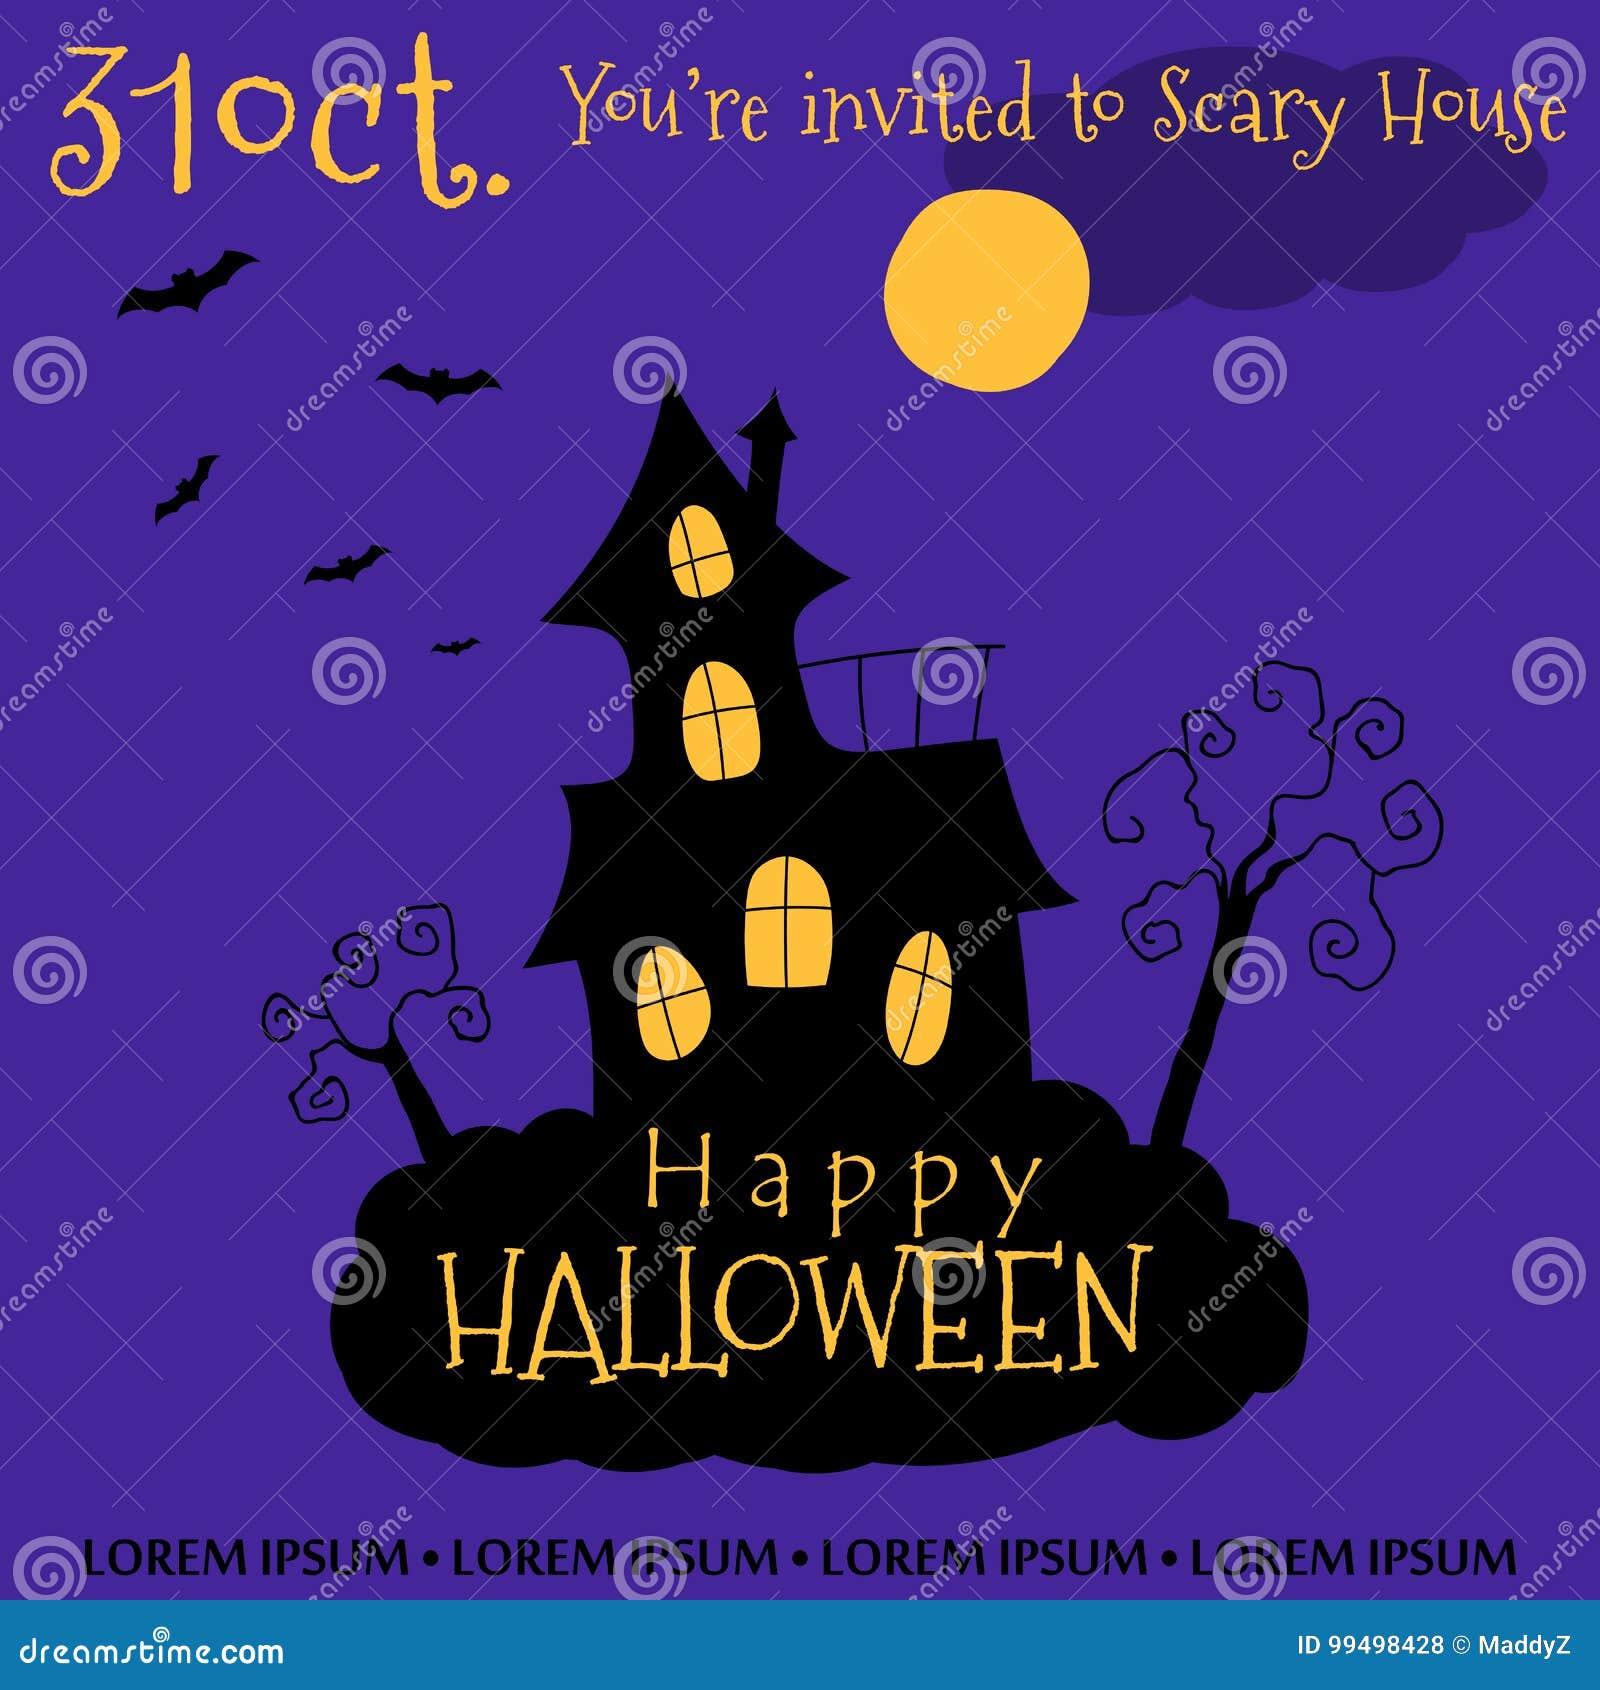 Happy Halloween Invitation Card Design Vector Illustration